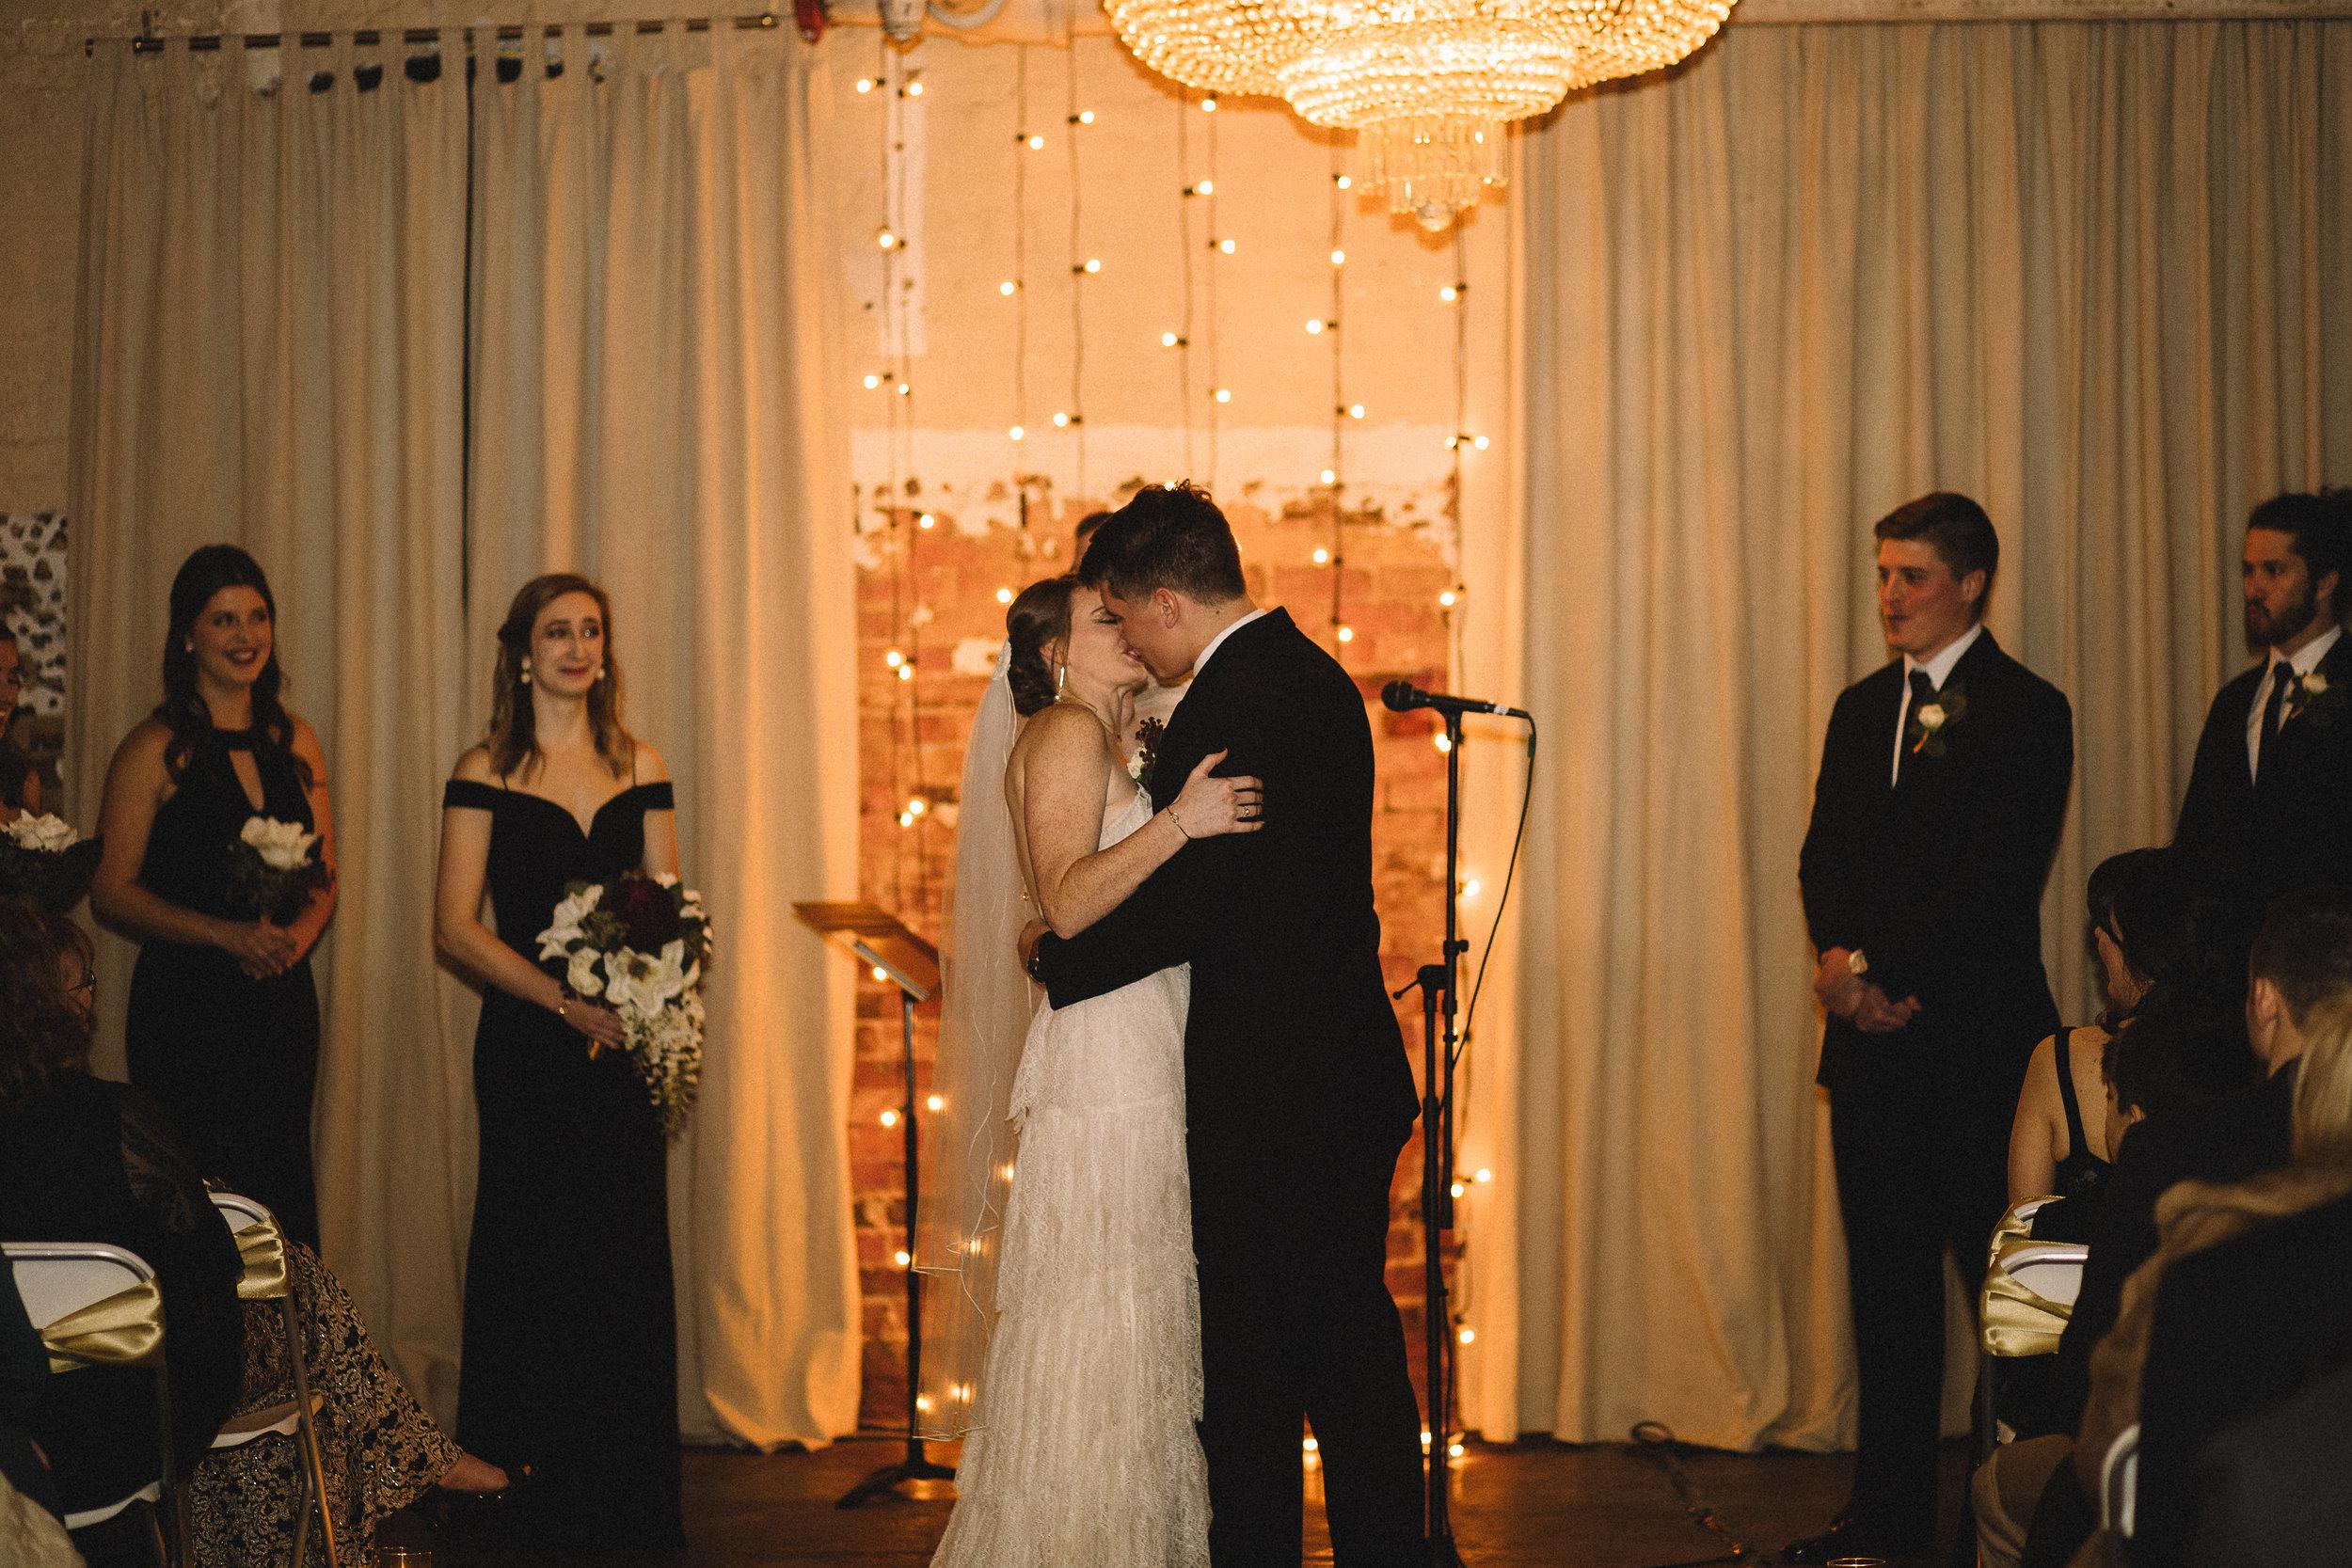 congrats to mr. & mrs. hatley!